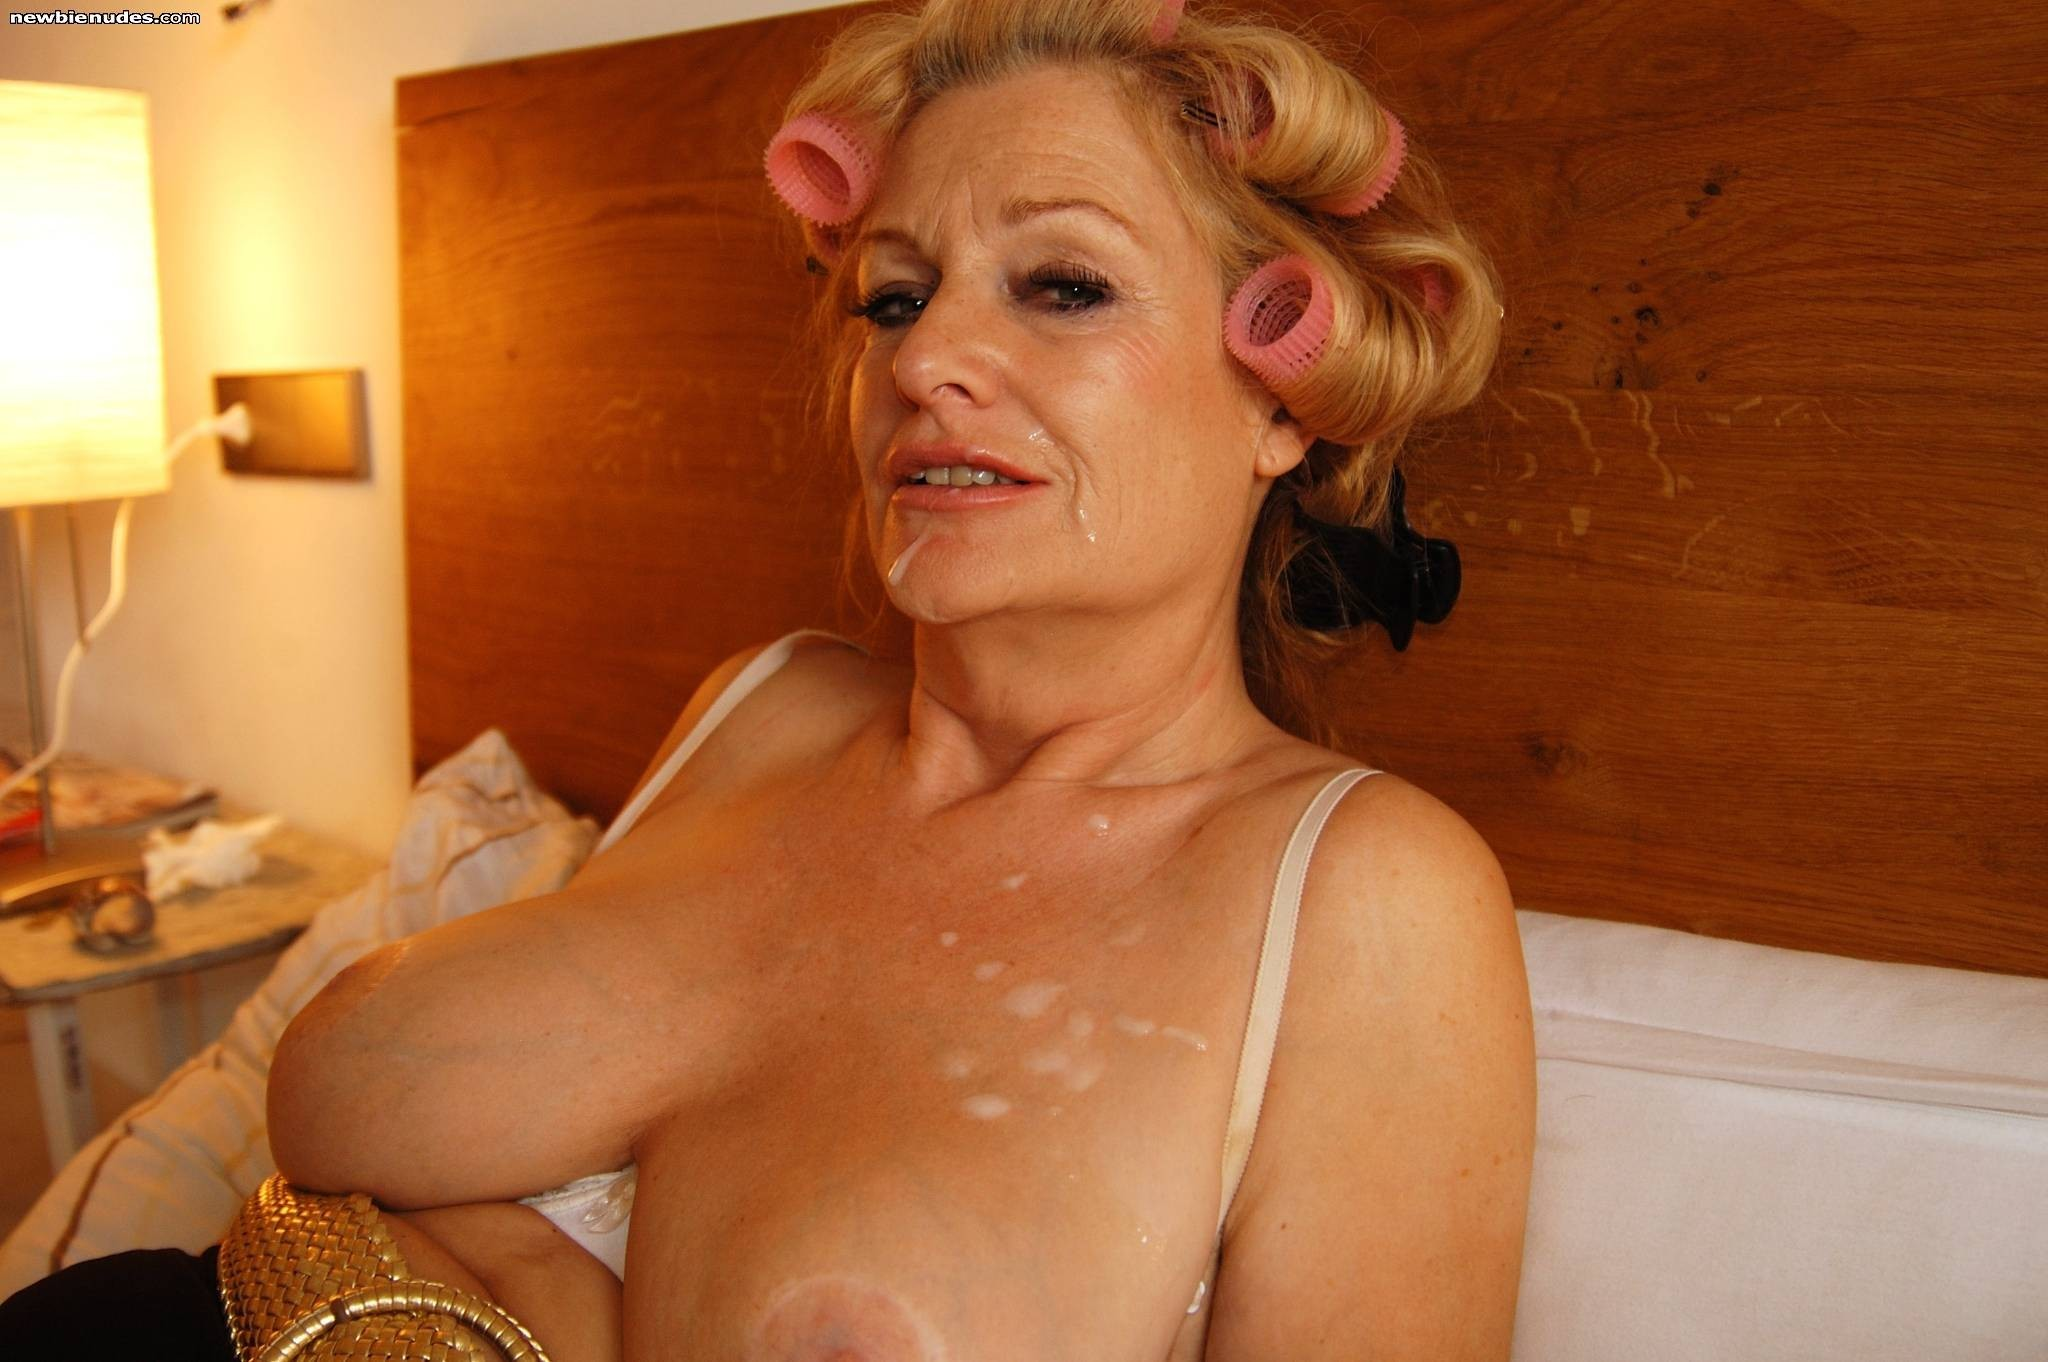 Hot mature woman porn